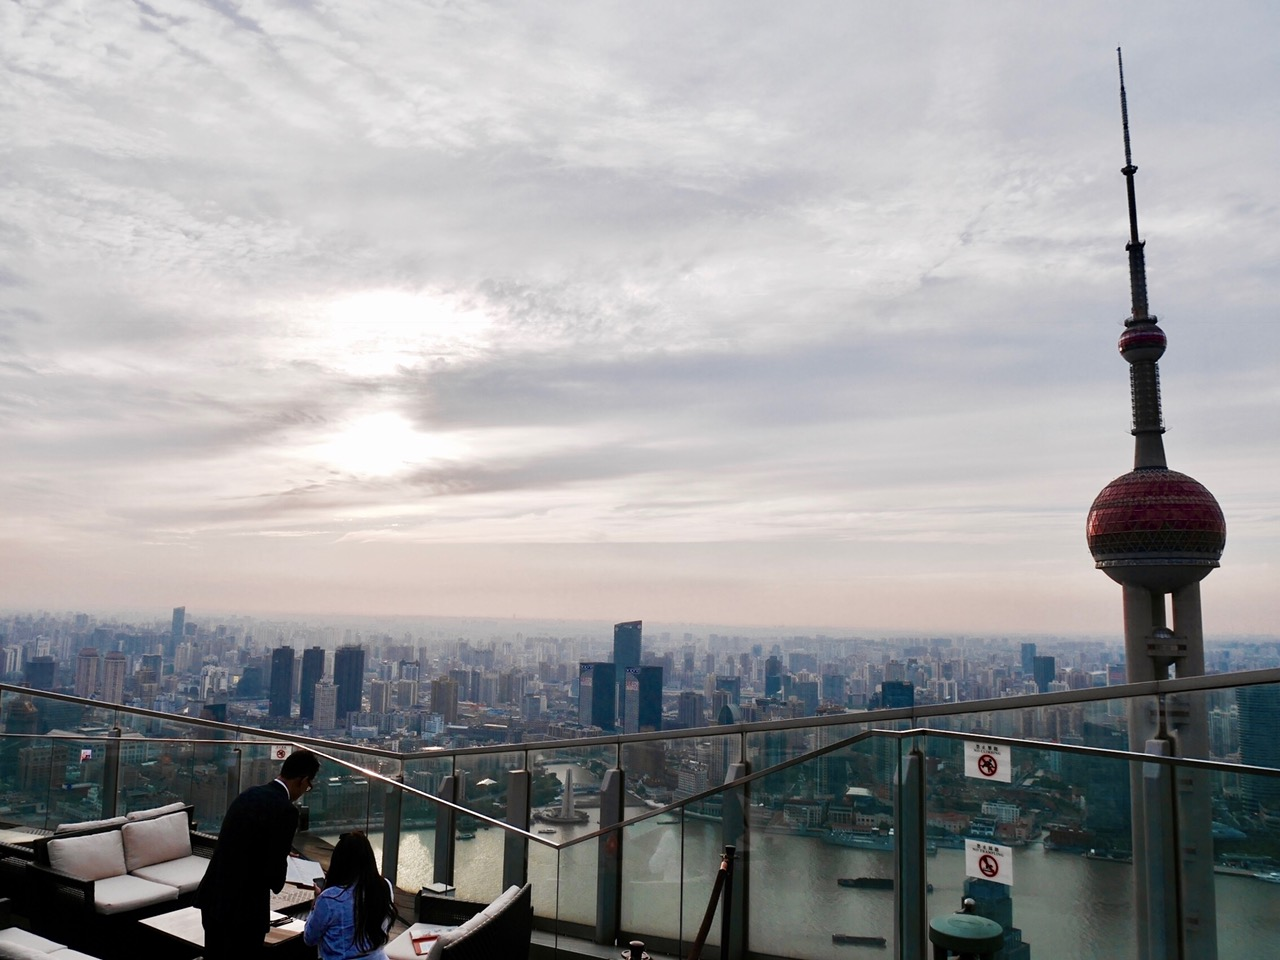 FullSizeRender 6 - Flair Rooftop - 外灘の夜景を見下ろす上海リッツカールトンルーフトップバー